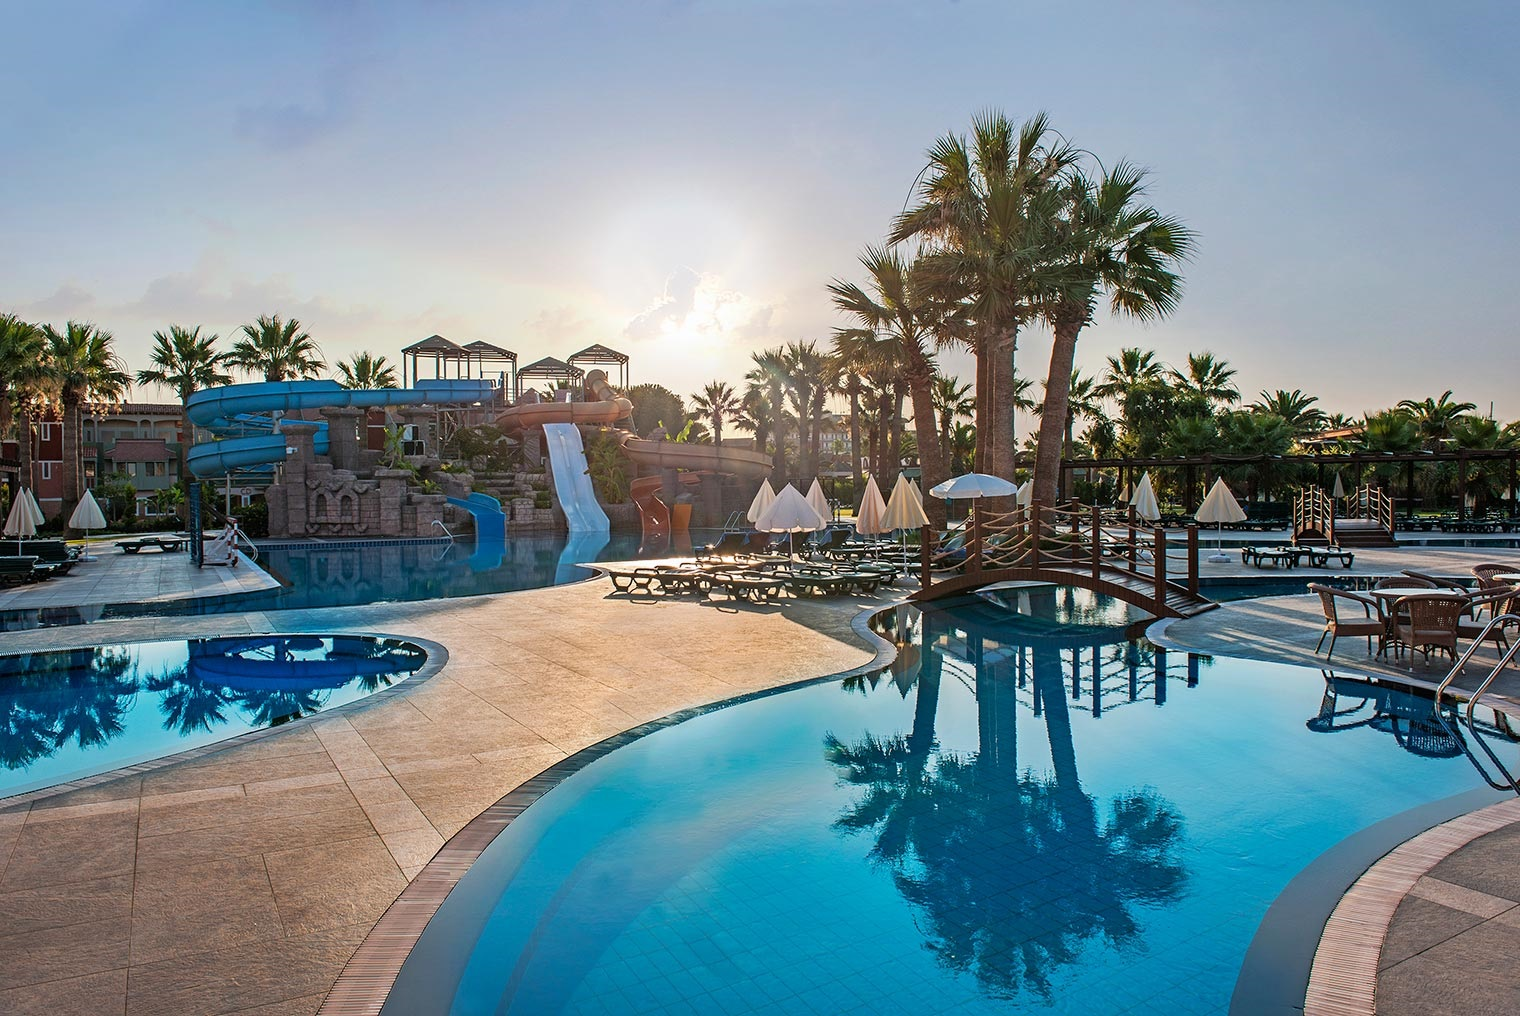 Знакомим с гостиницами для отдыха в Турции   Курорт Даламан